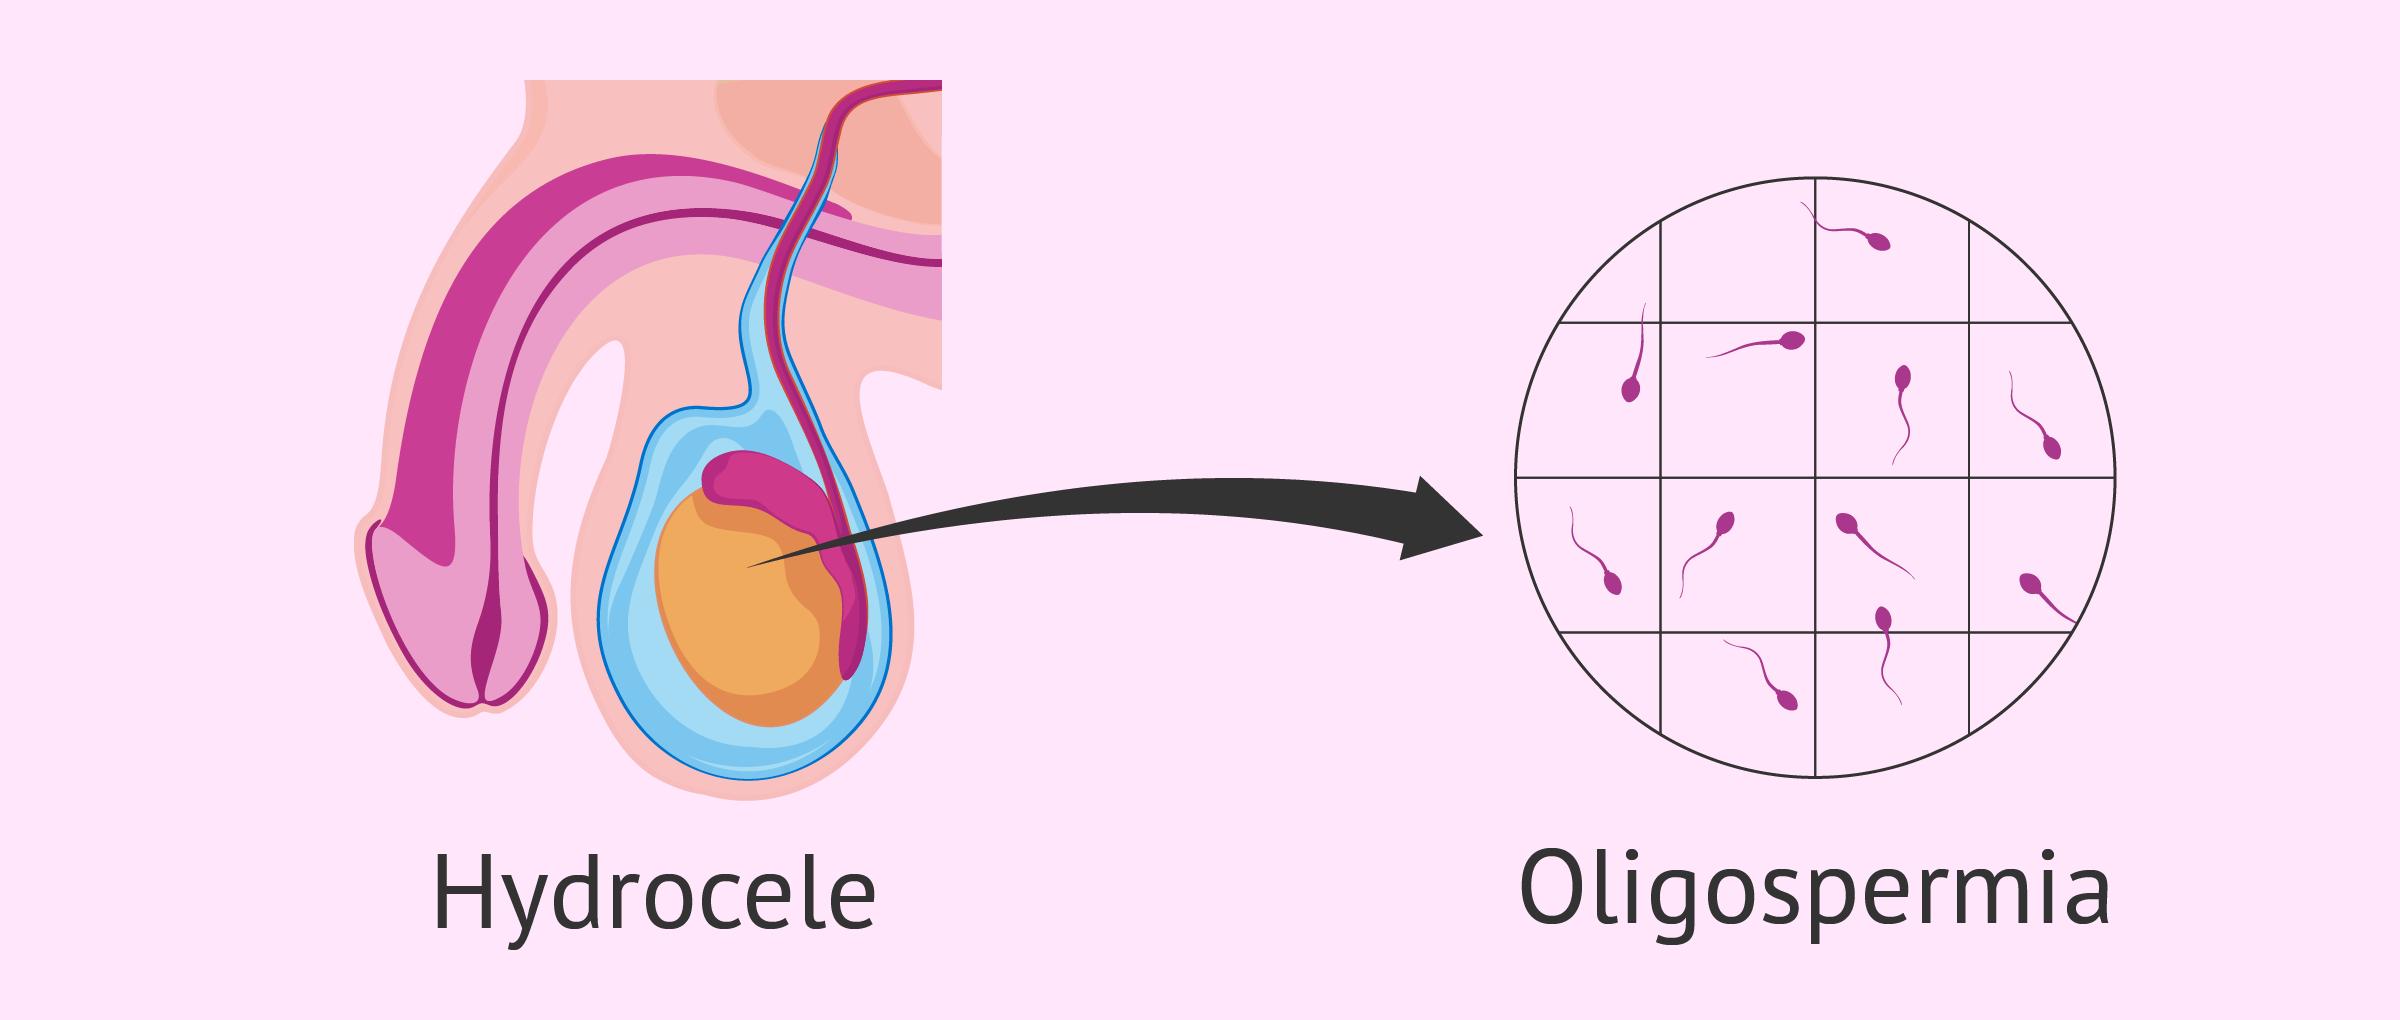 Oligozoospermia and testicular hydrocele